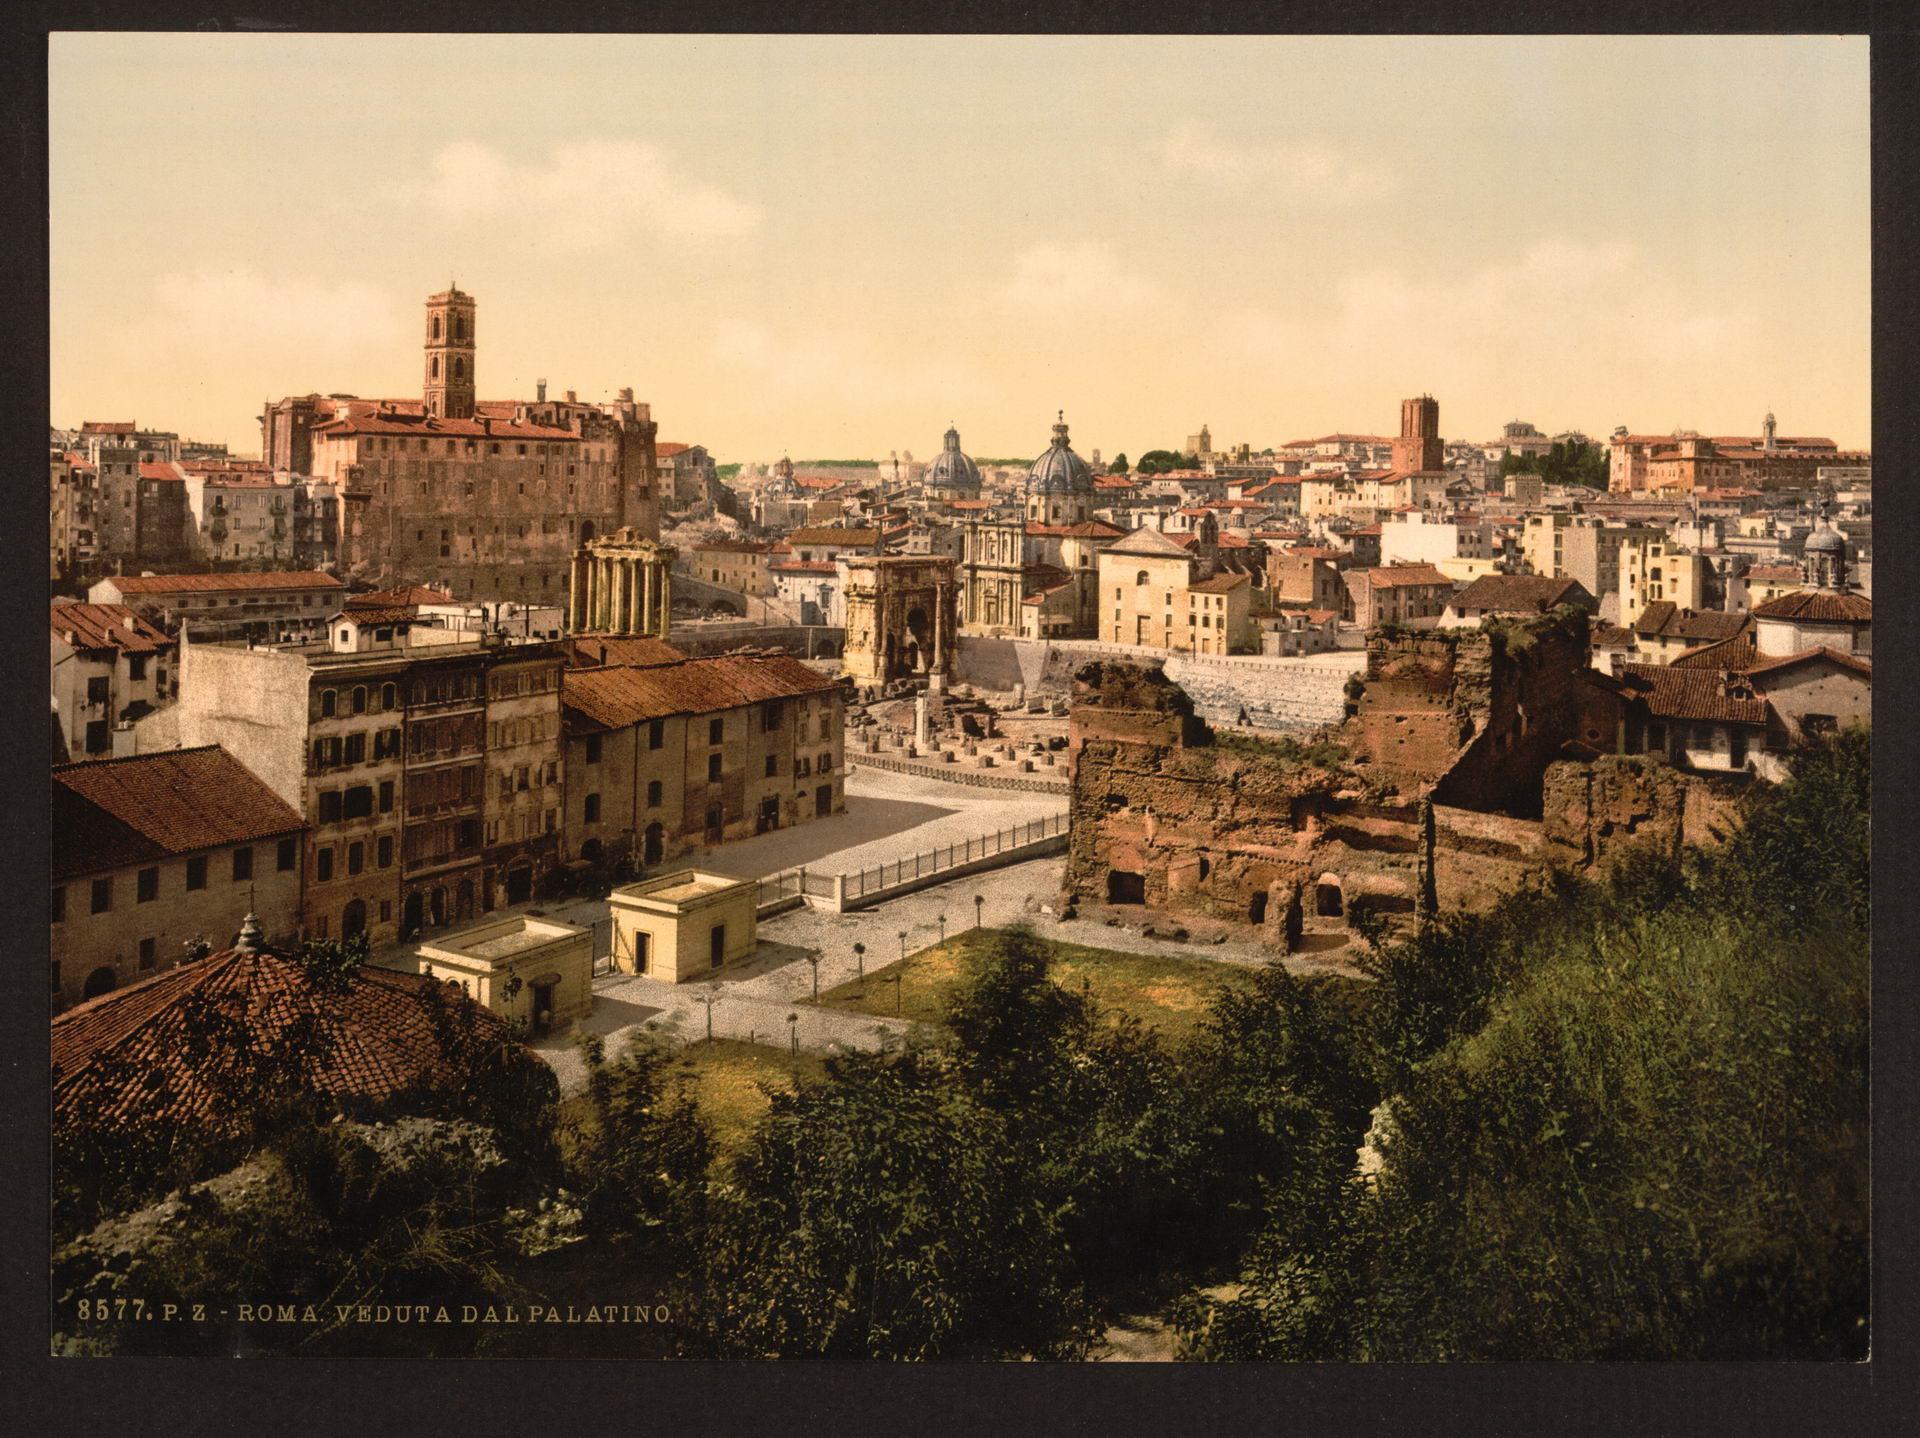 Цветные ретро фотографии Италии конца XIX века (60 фото)